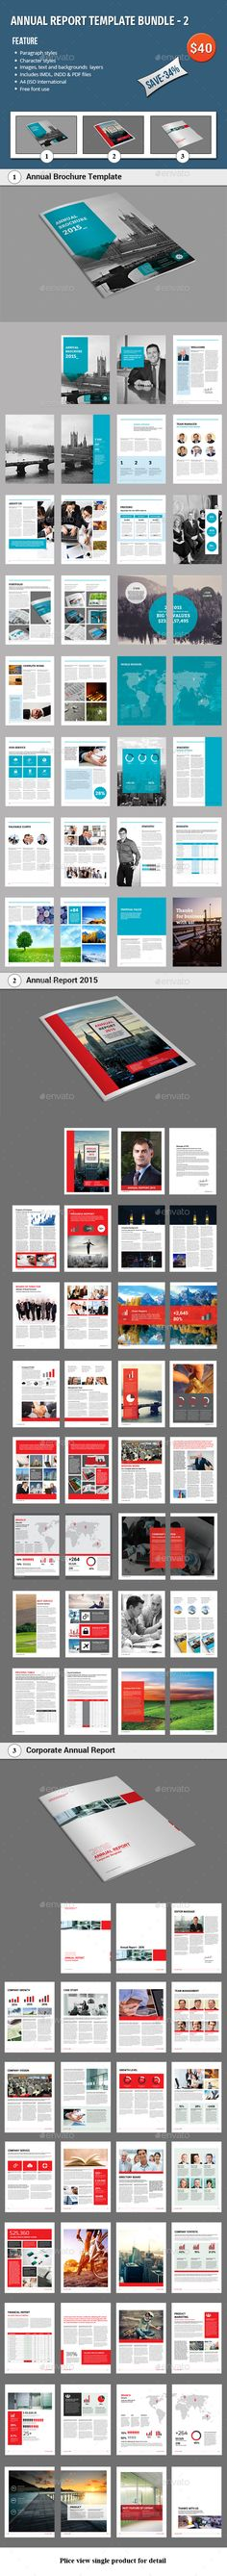 annual report template bundle 2 informational brochuresdownload here http